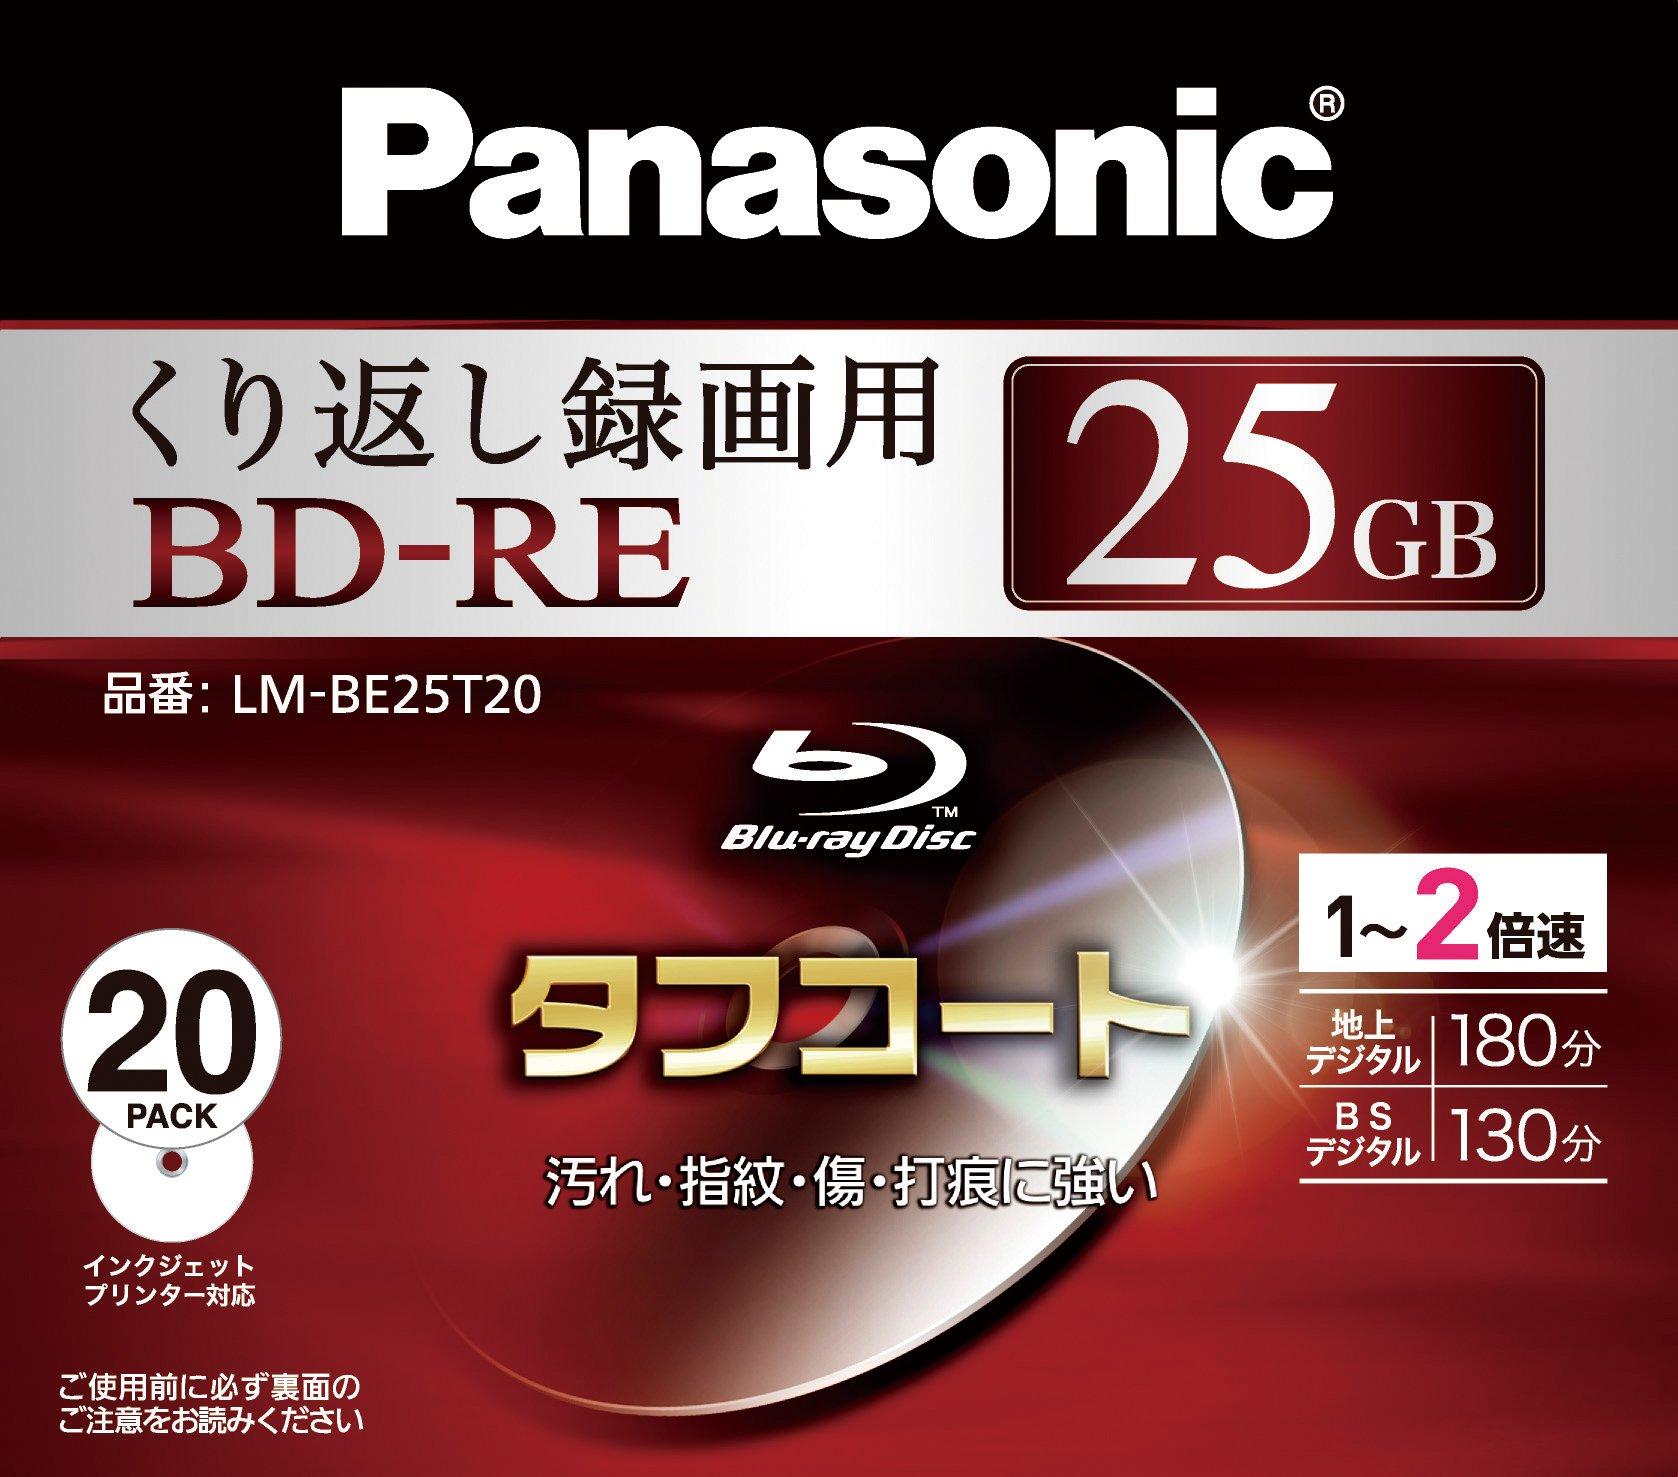 PANASONIC Blu-ray BD-RE Rewritable Disk   25GB 2x Speed   20 Pack Ink-jet Printable (Japan Import)